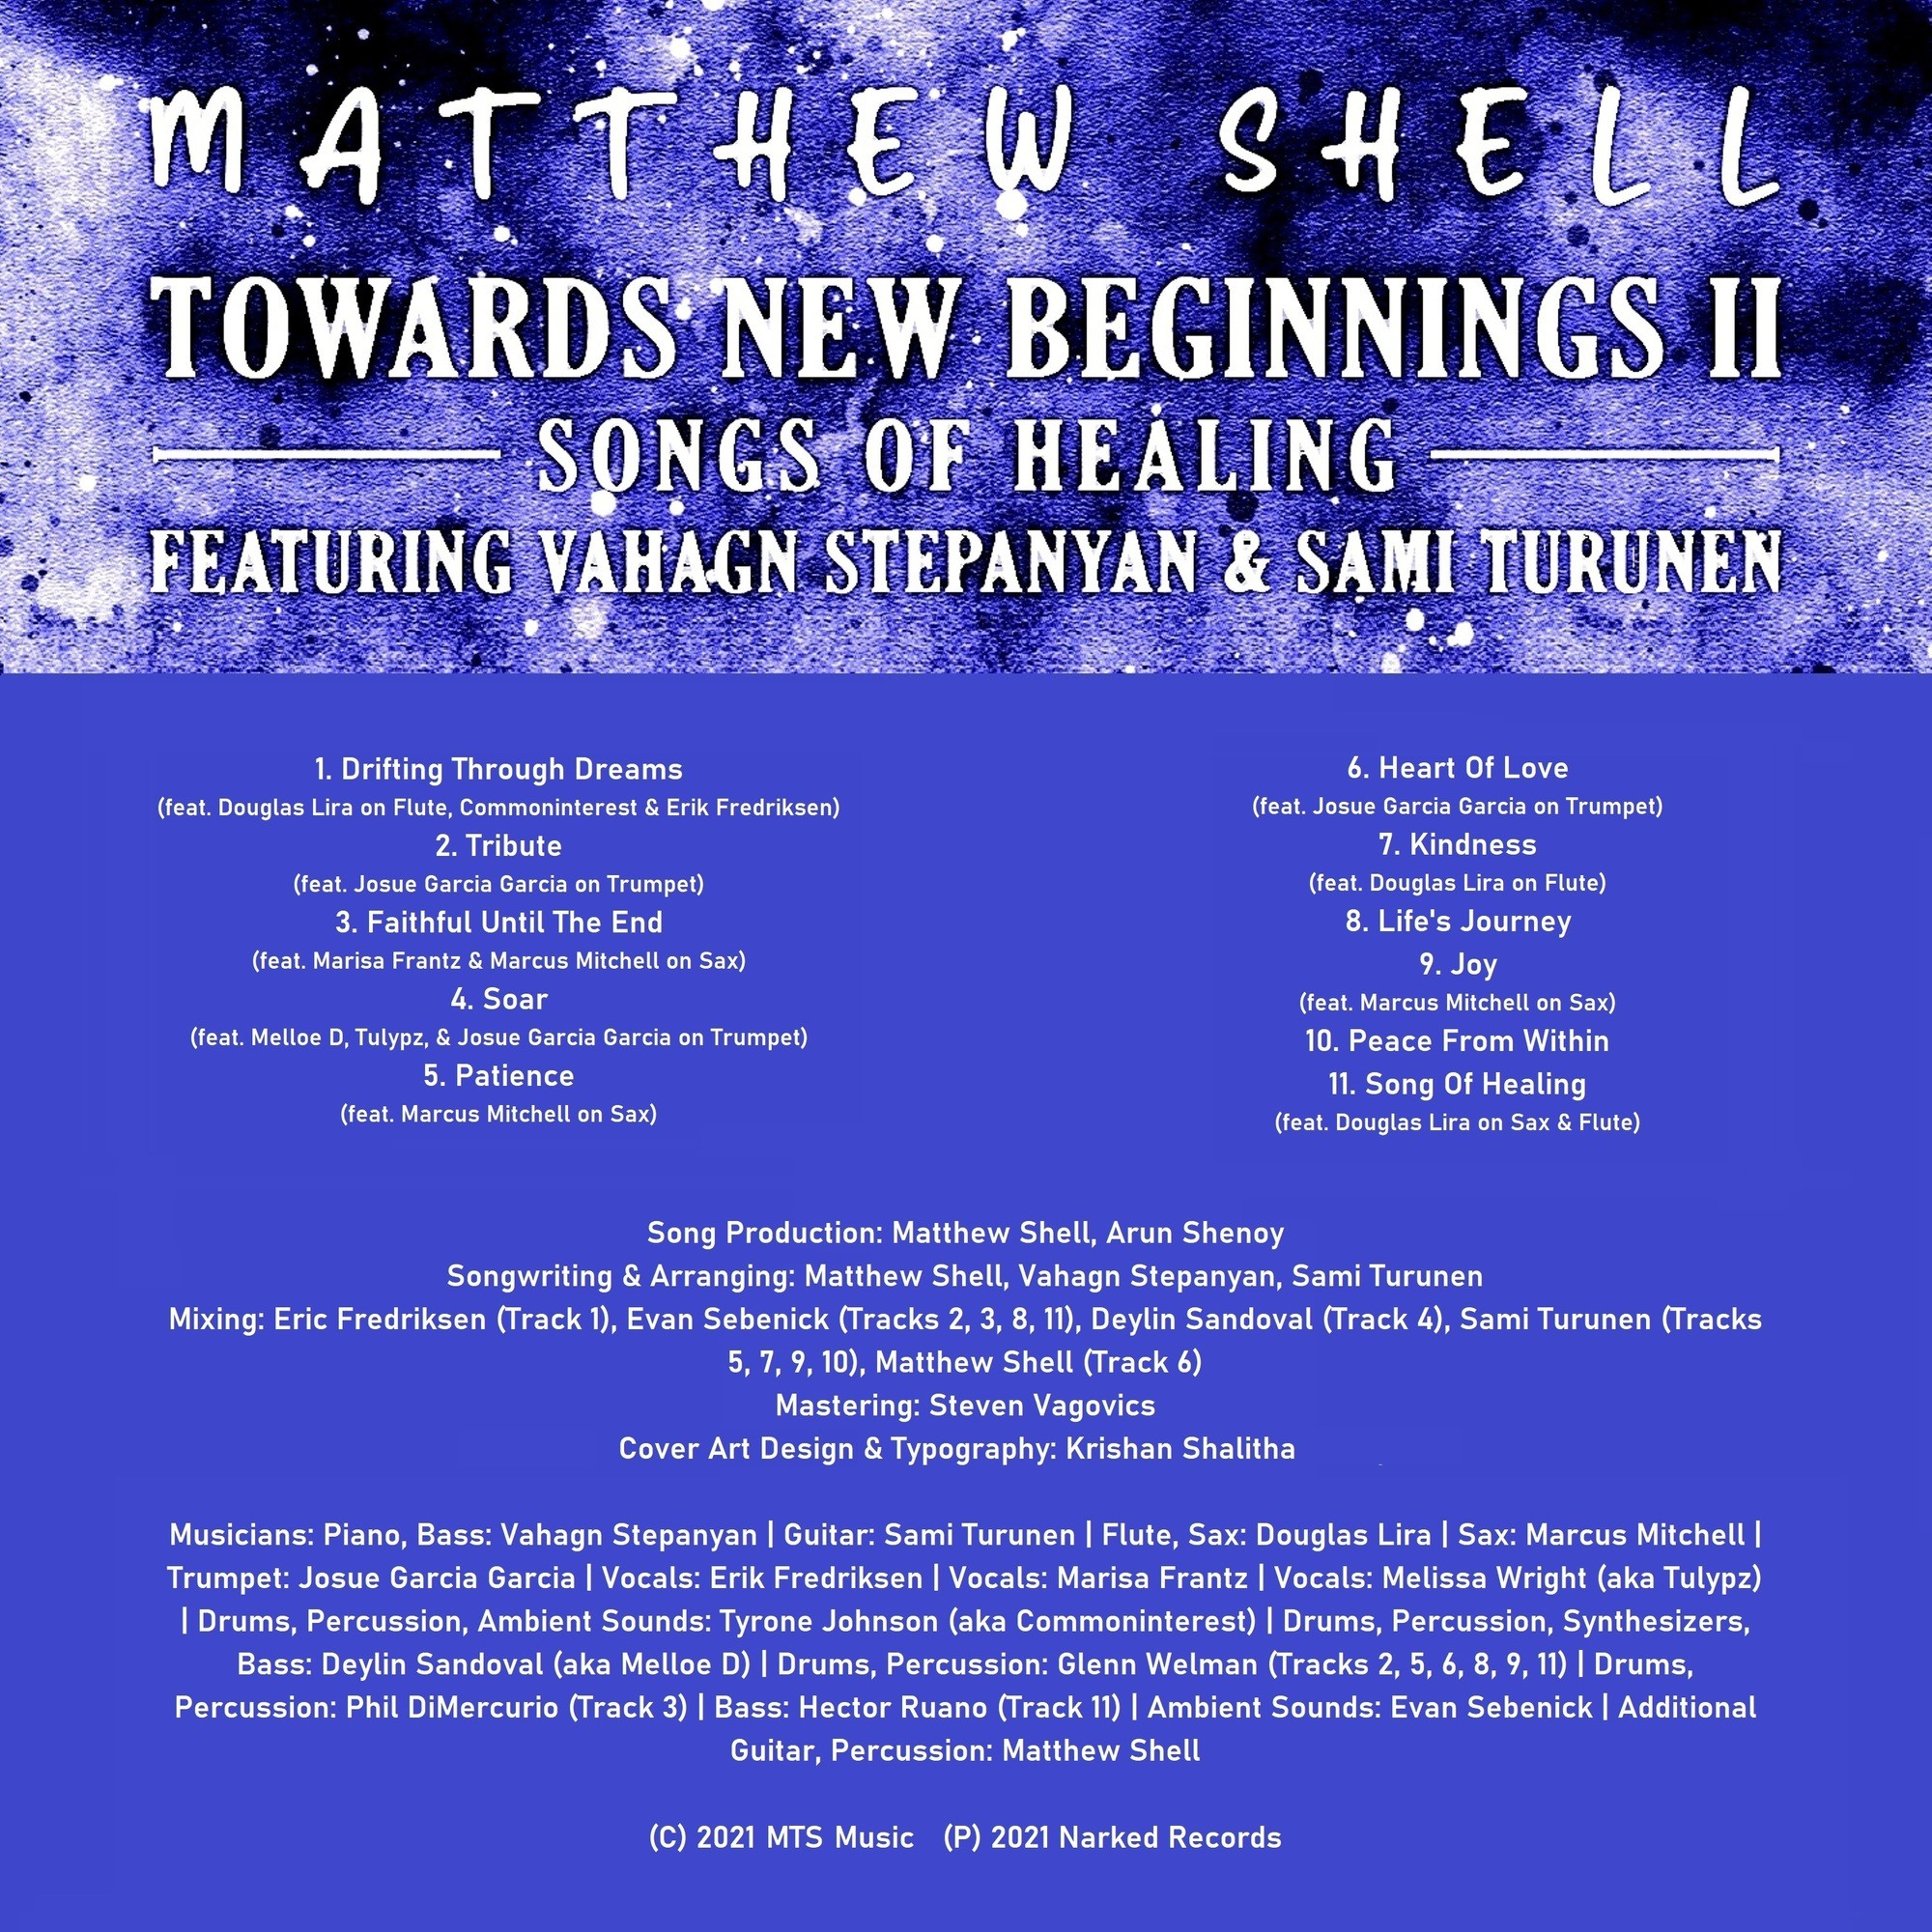 Towards New Beginnings II - Credits Sheet